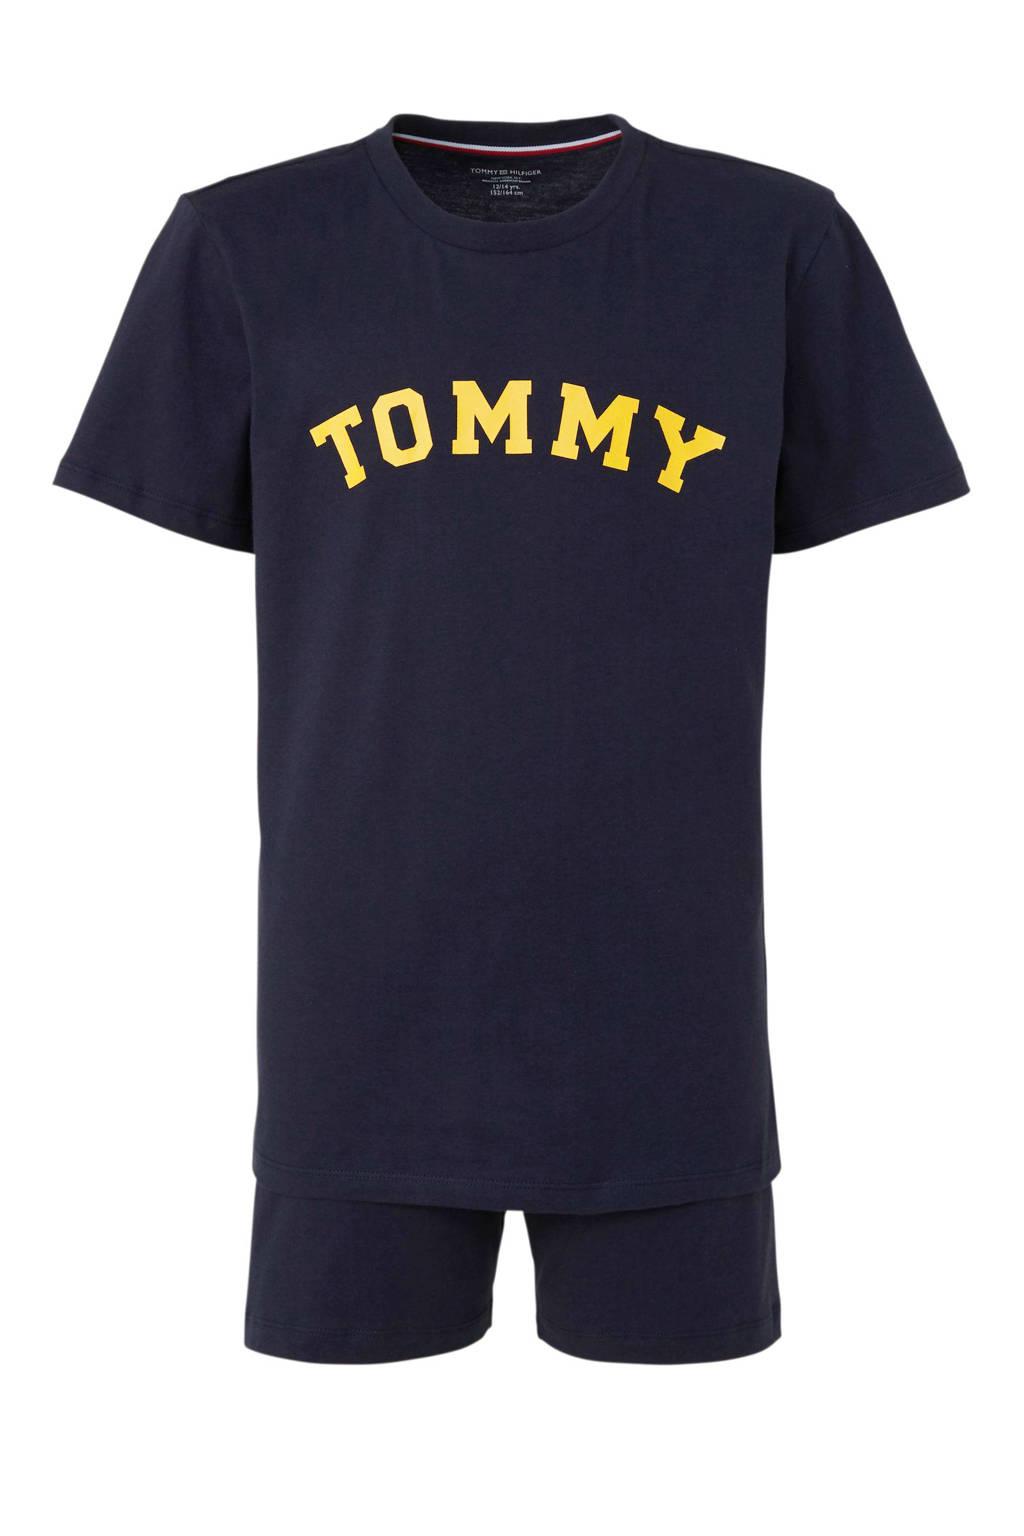 Tommy Hilfiger   shortama met logo donkerblauw, Donkerblauw